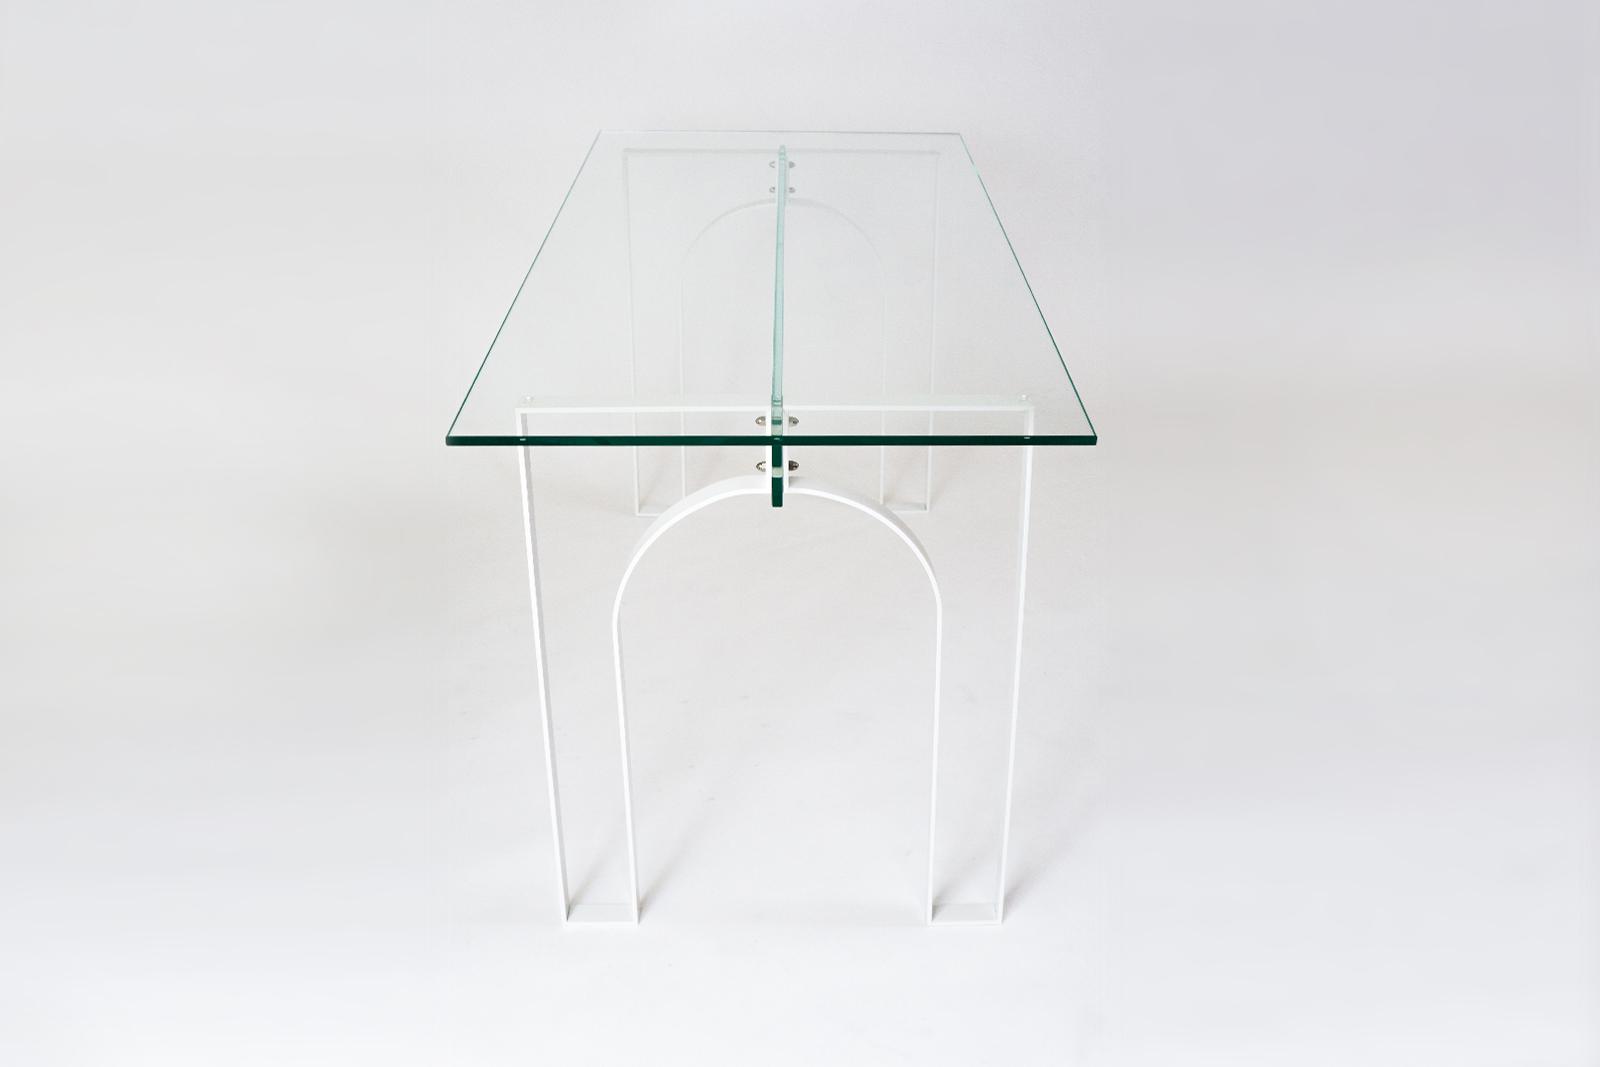 durodeco_Arch Desk (3).jpg